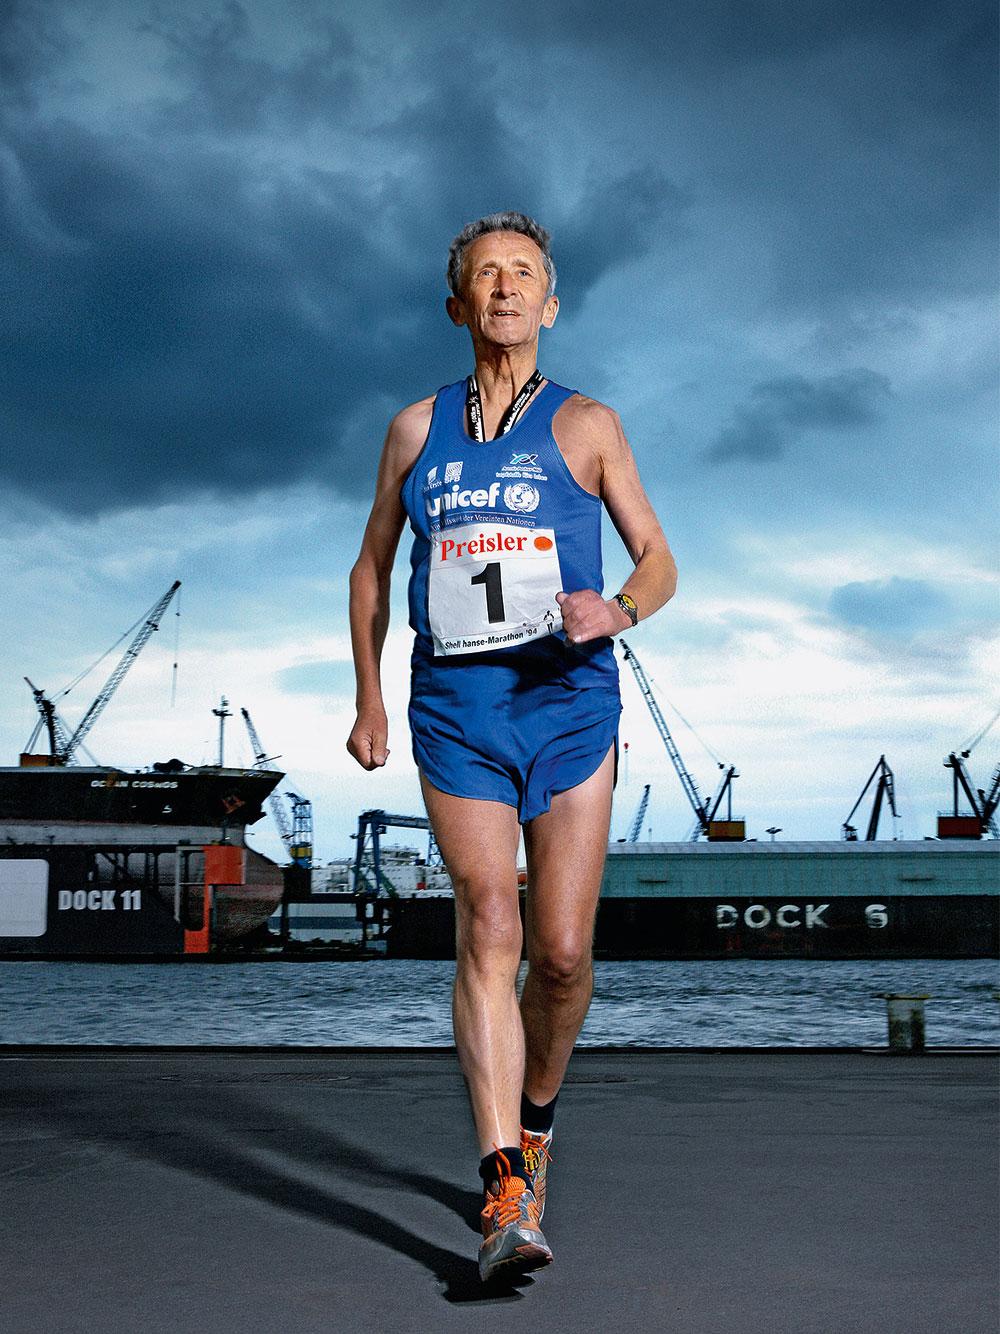 Horst Preisler, 73, Marathonläufer, Hamburg, 2009